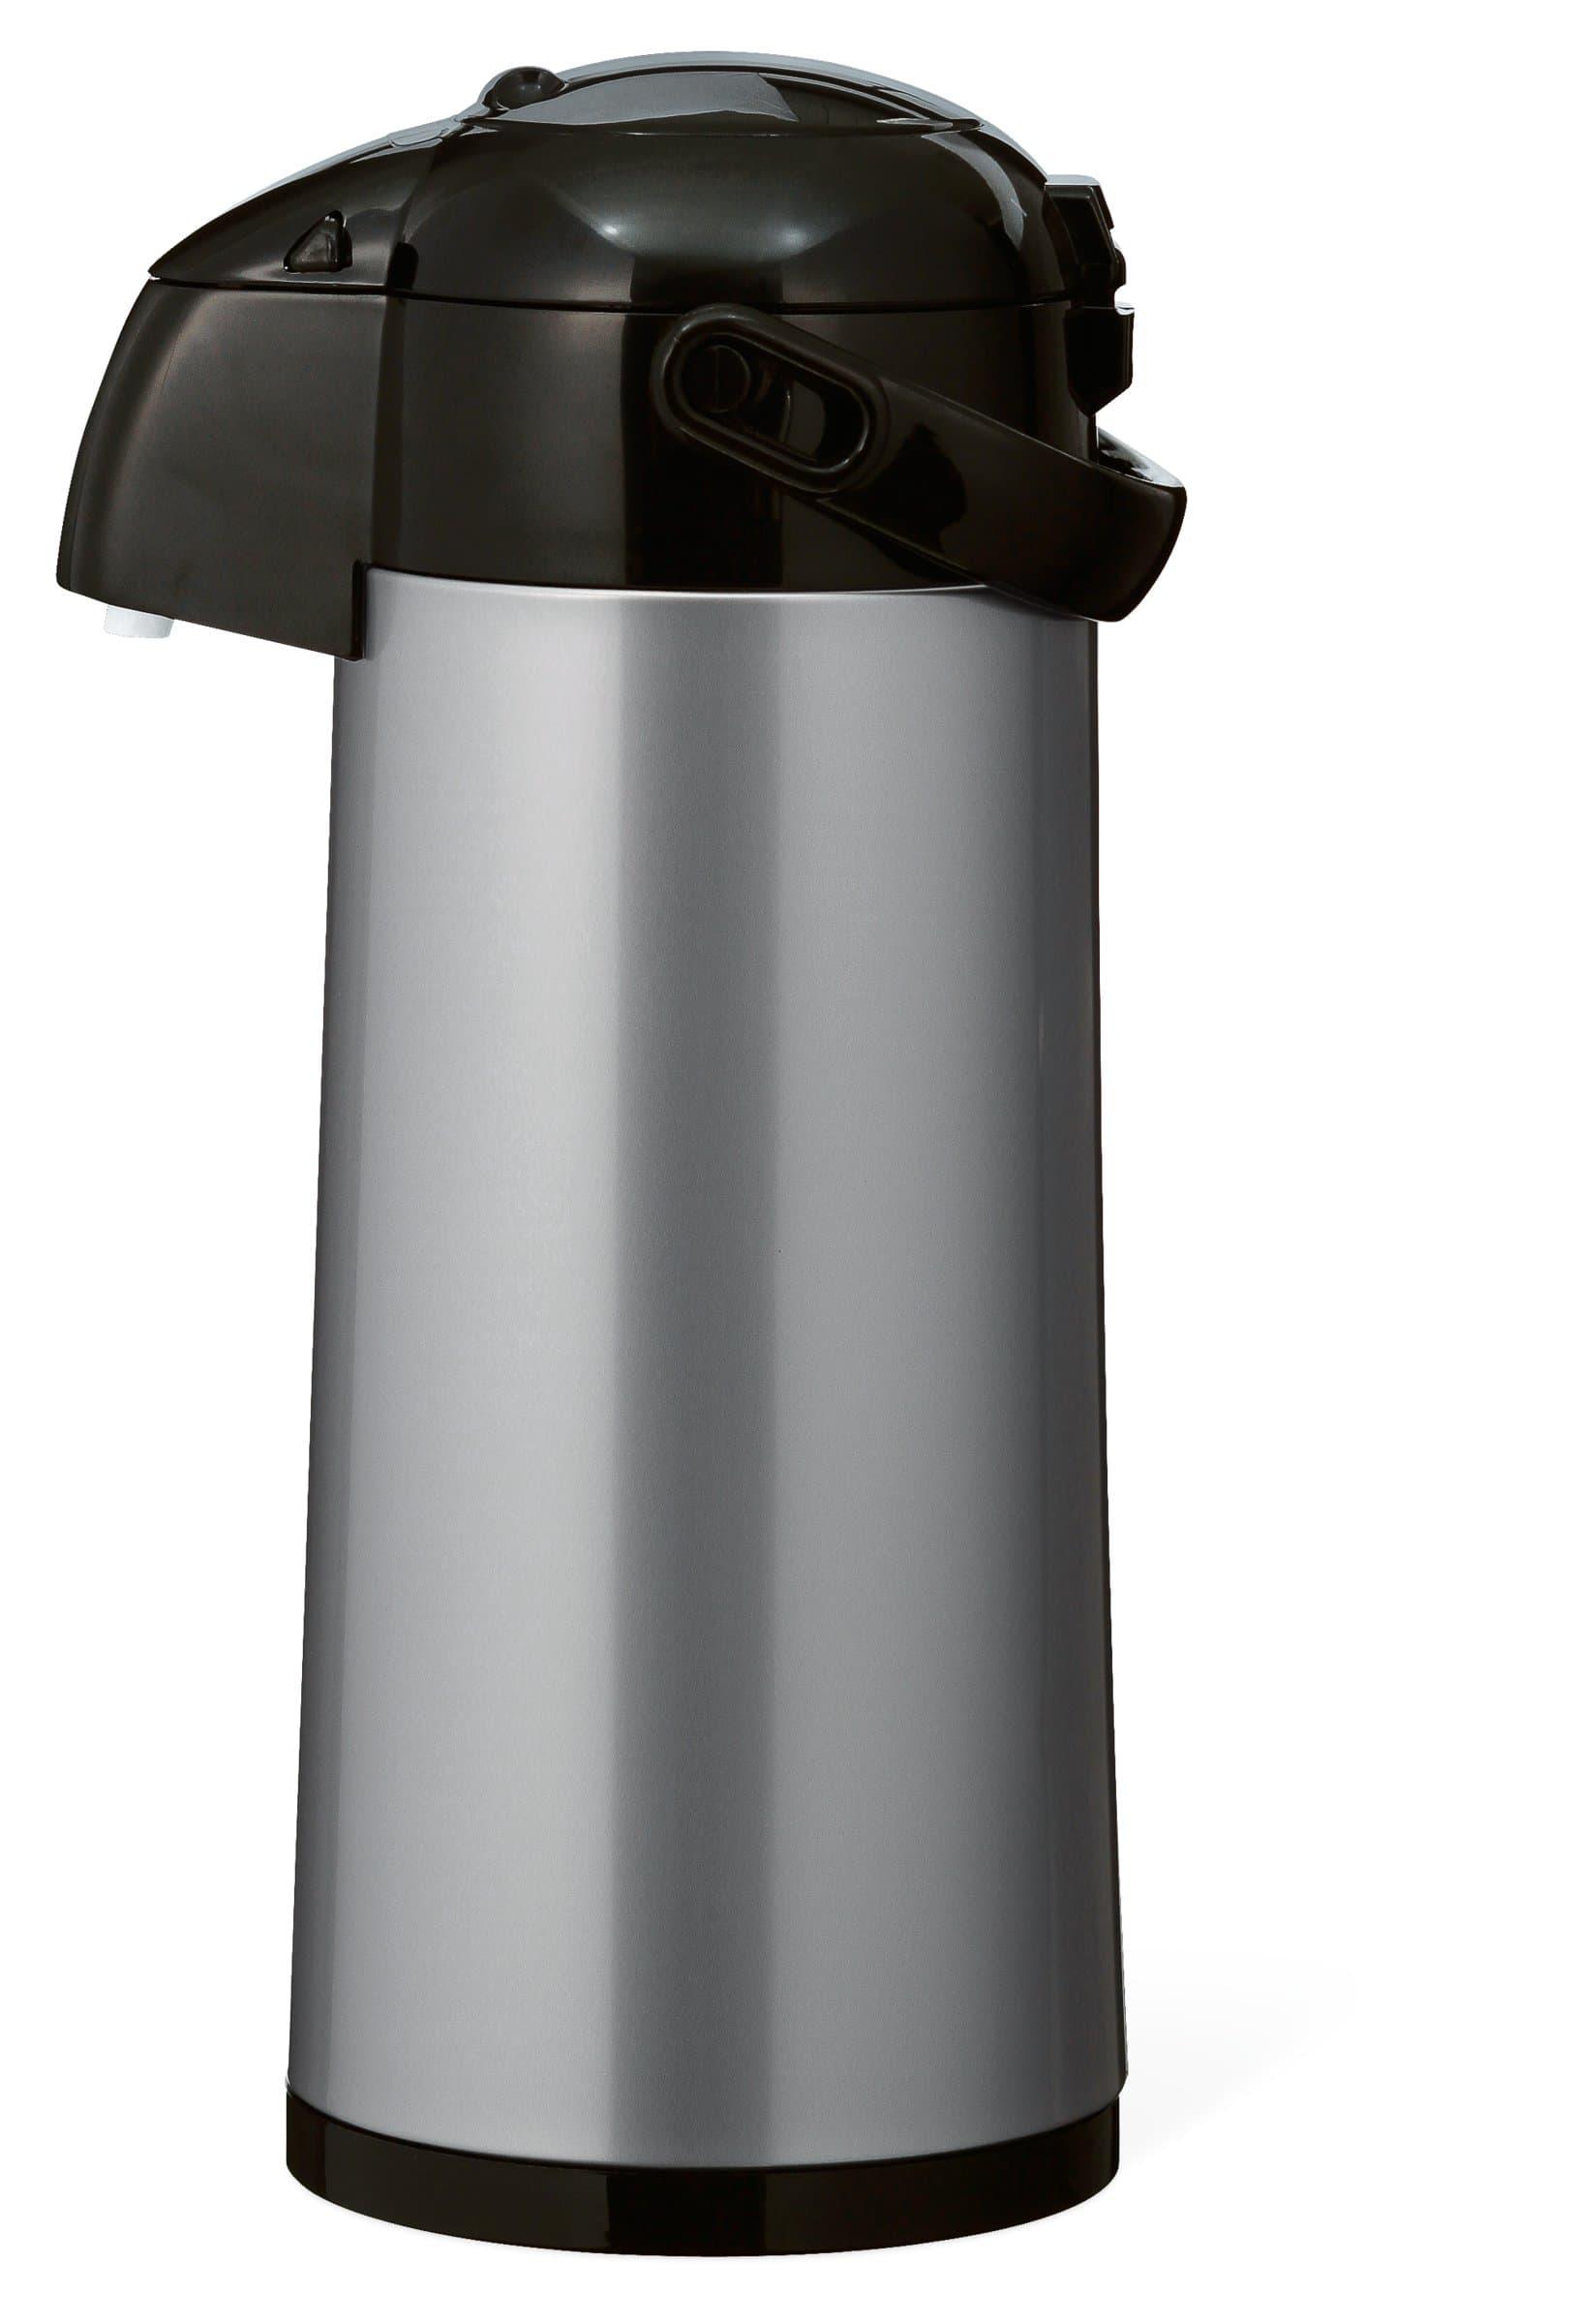 Cucina & Tavola Airpot